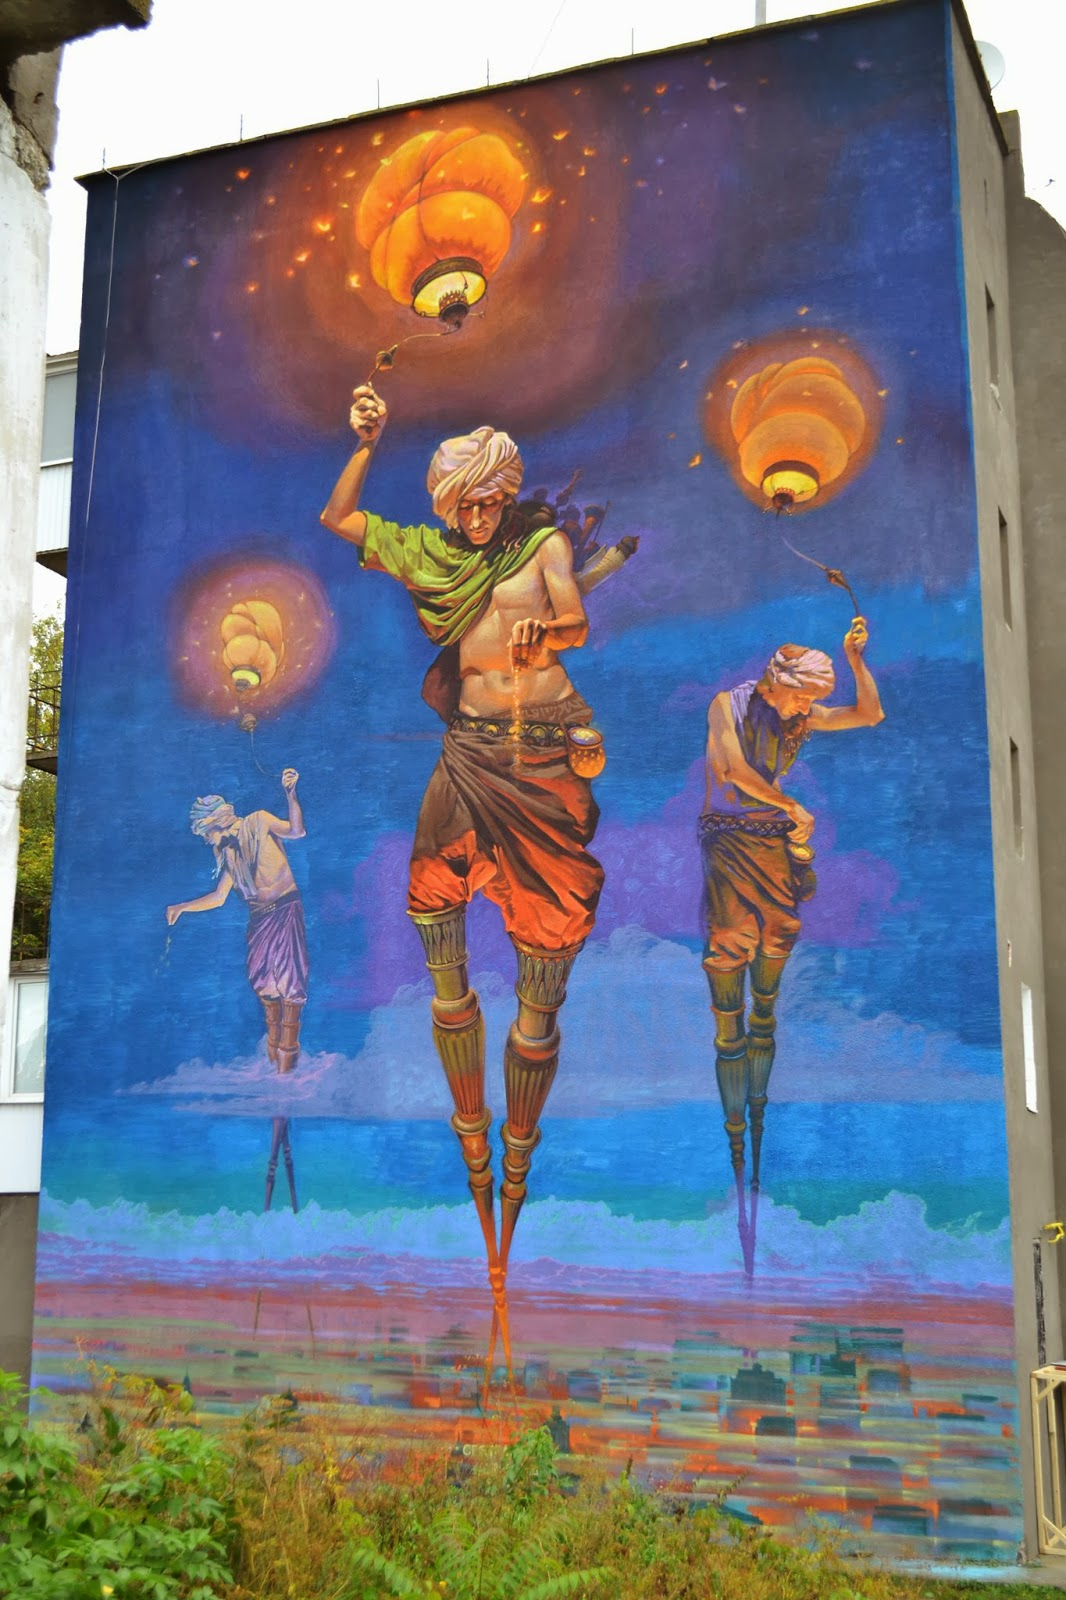 Alexander grebenyuk new mural in kamianets podilskyi for Mural street art